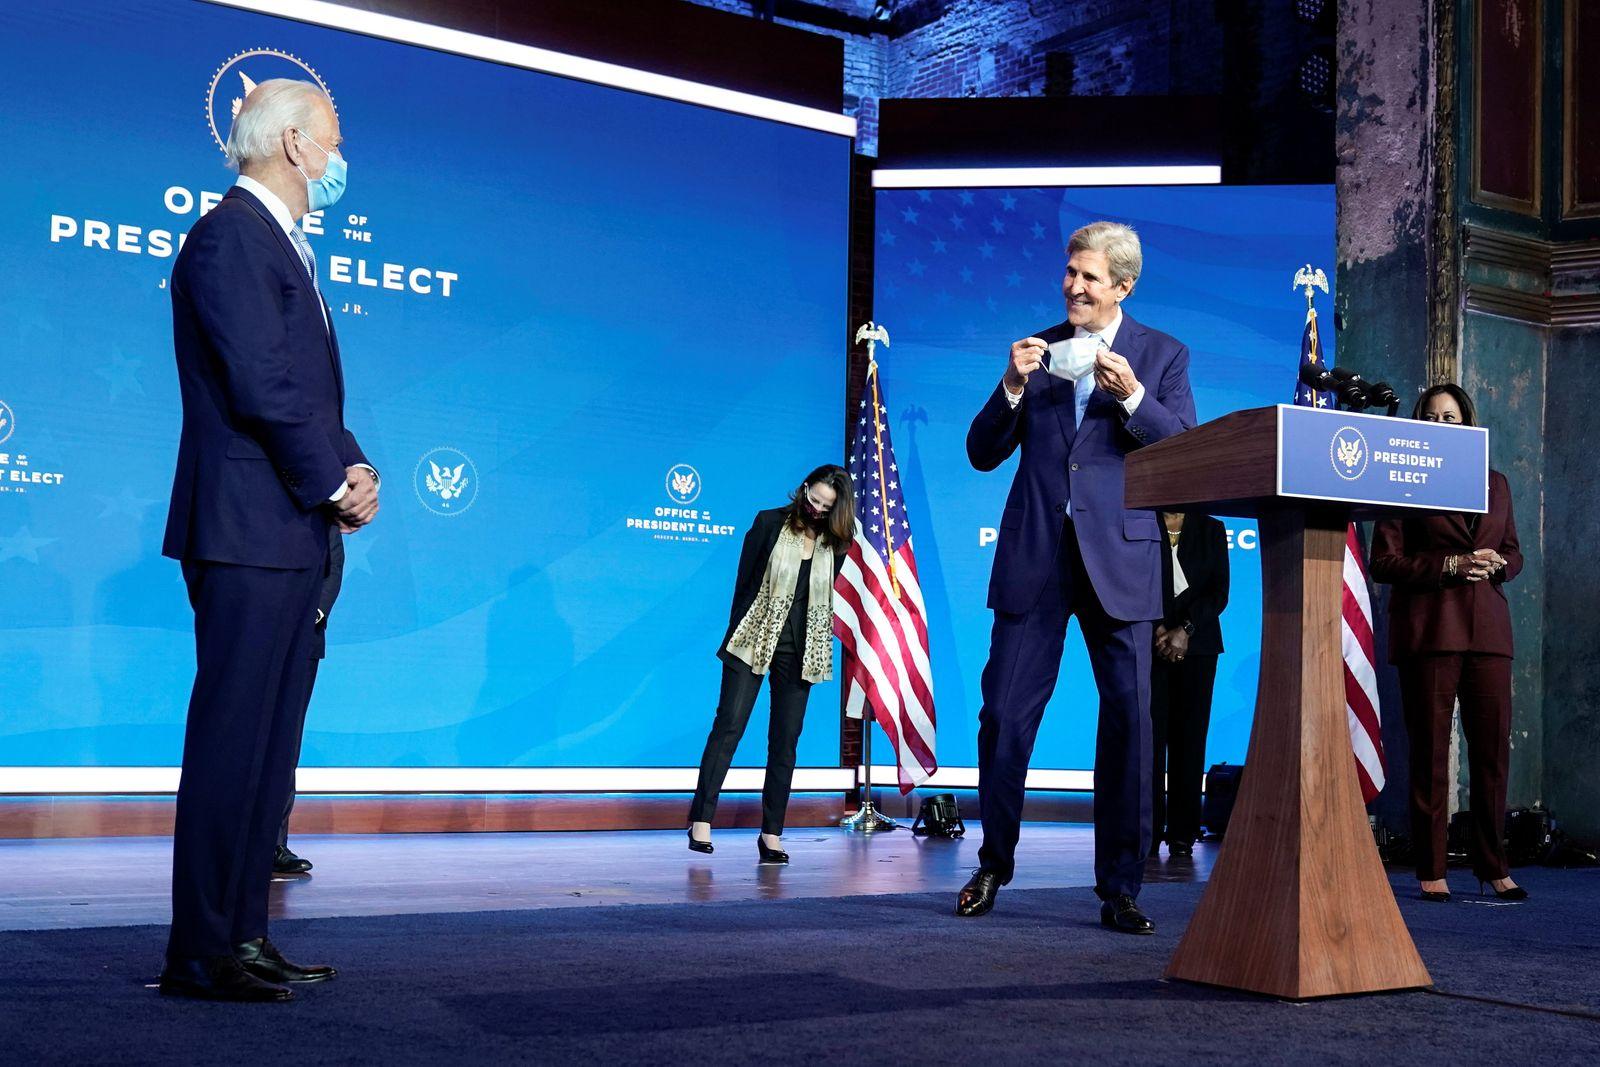 President-elect Joe Biden's nominee to be a special envoy for climate change John Kerry speaks in Wilmington, Delaware